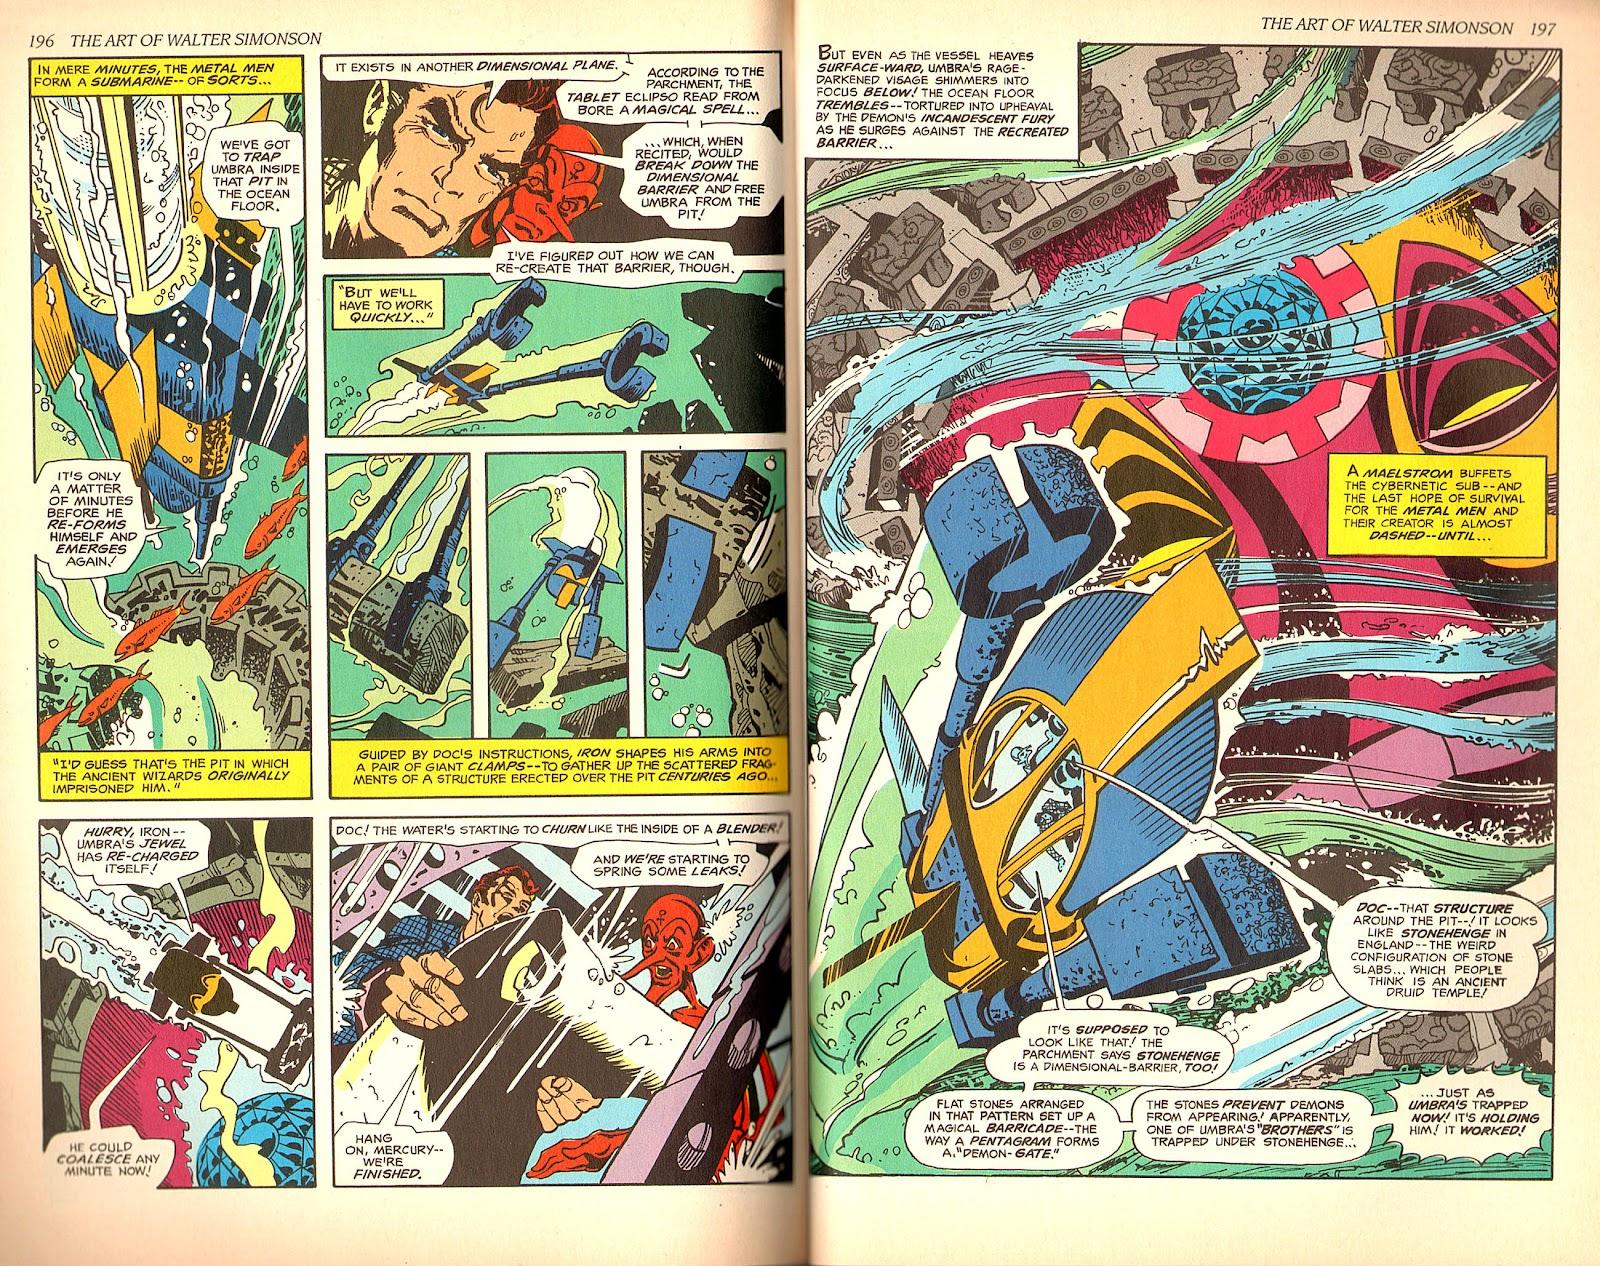 Read online The Art of Walter Simonson comic -  Issue # TPB - 100